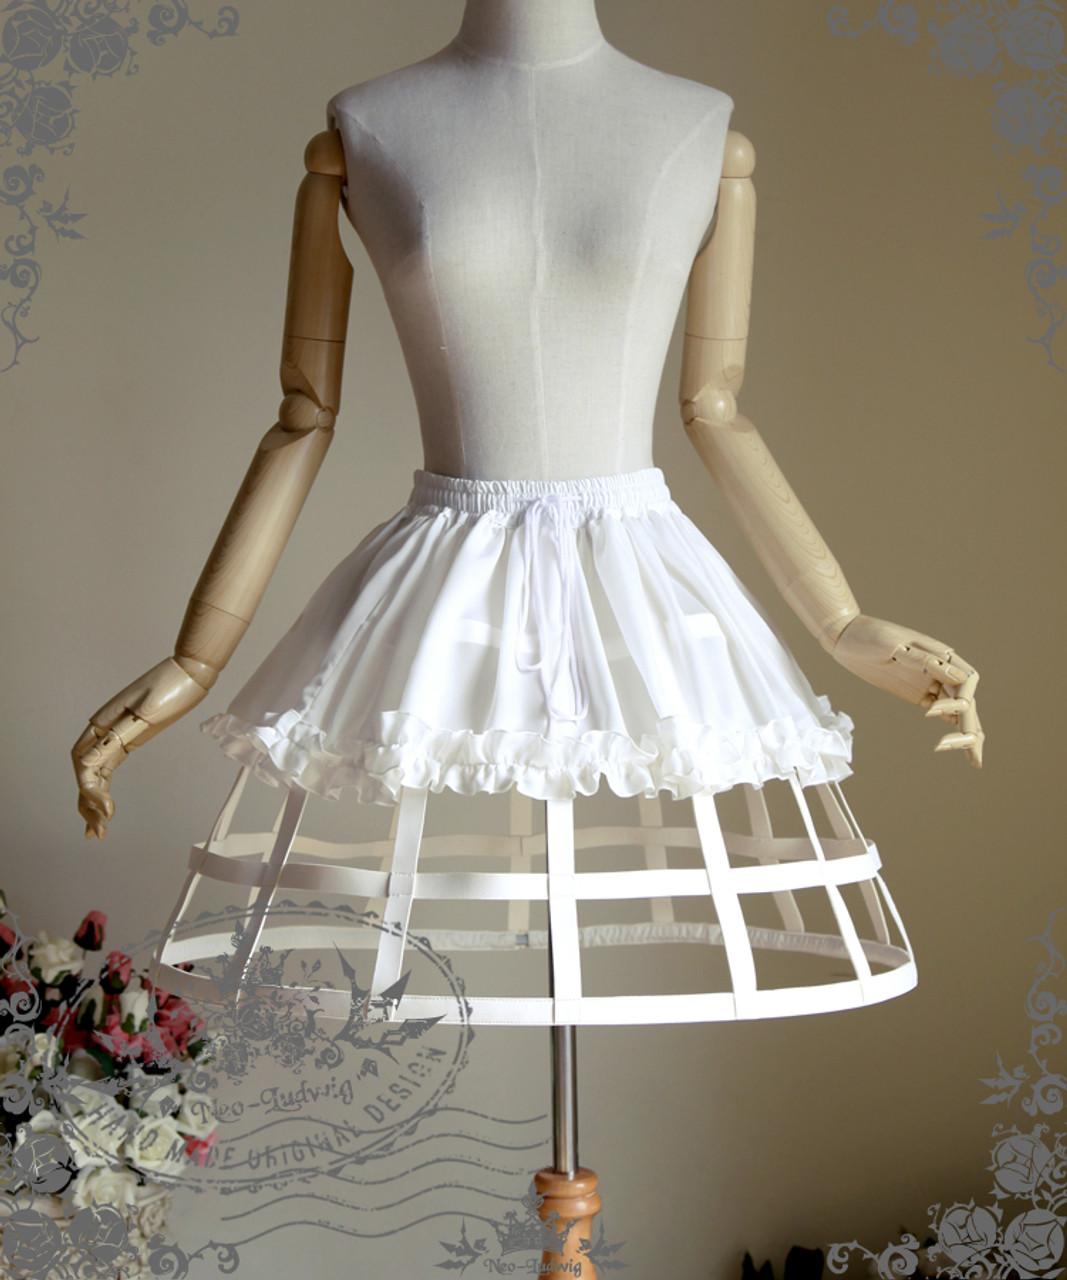 e8e973acc Steampunk Crinoline Midi Skirt Petticoat Cage Skirt Hoop Skirt Black ...